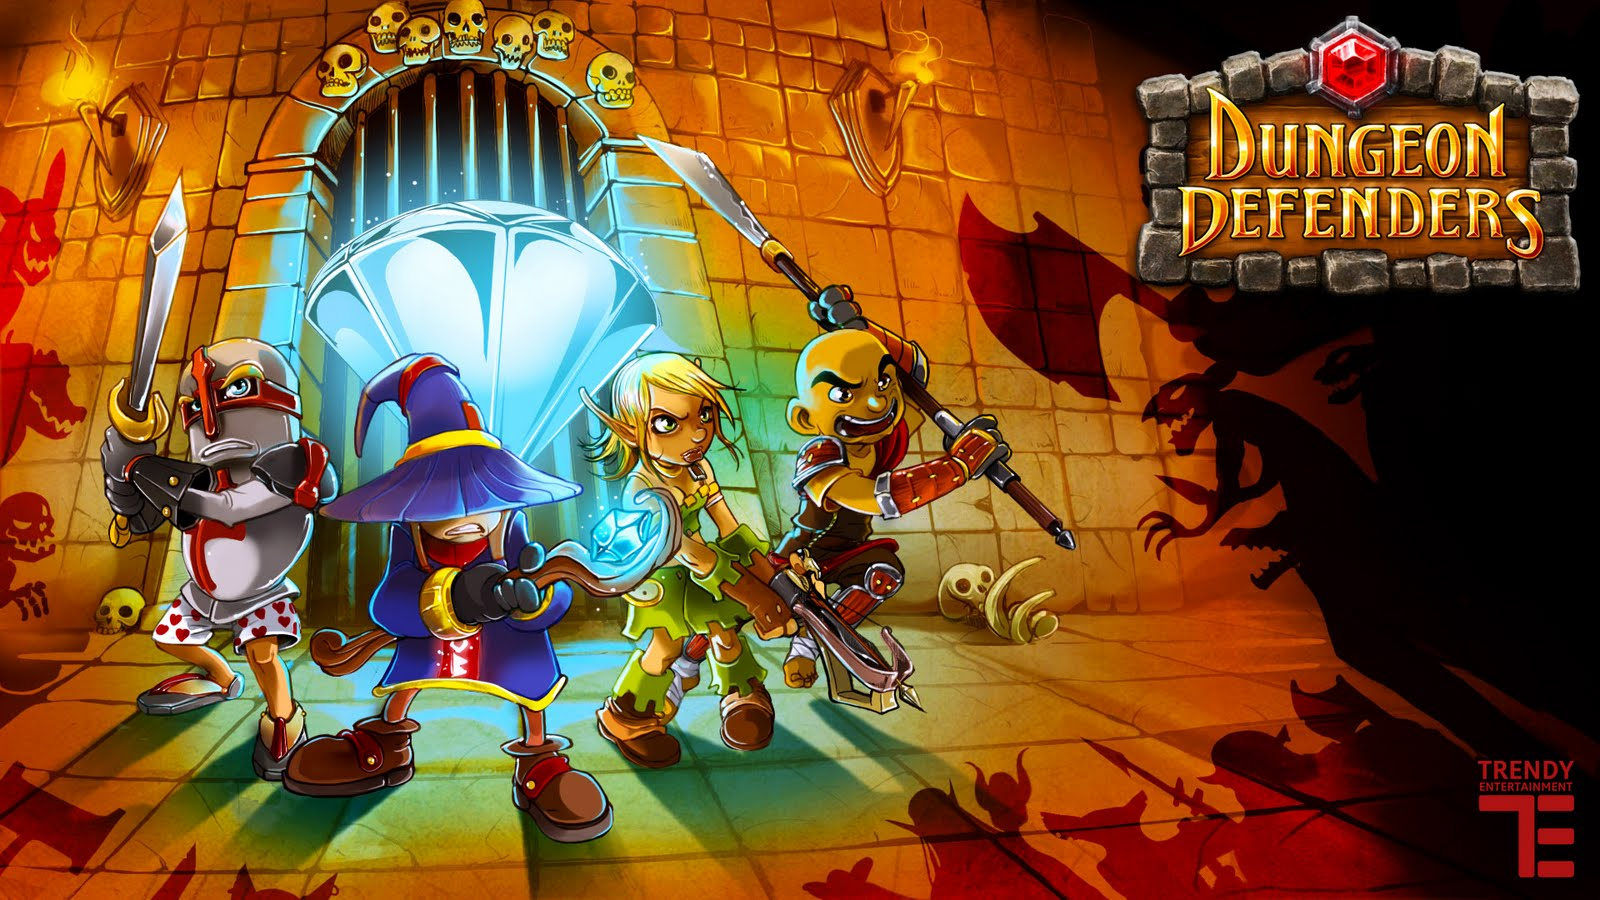 Аносирован Dungeon Defenders 2 - Изображение 1